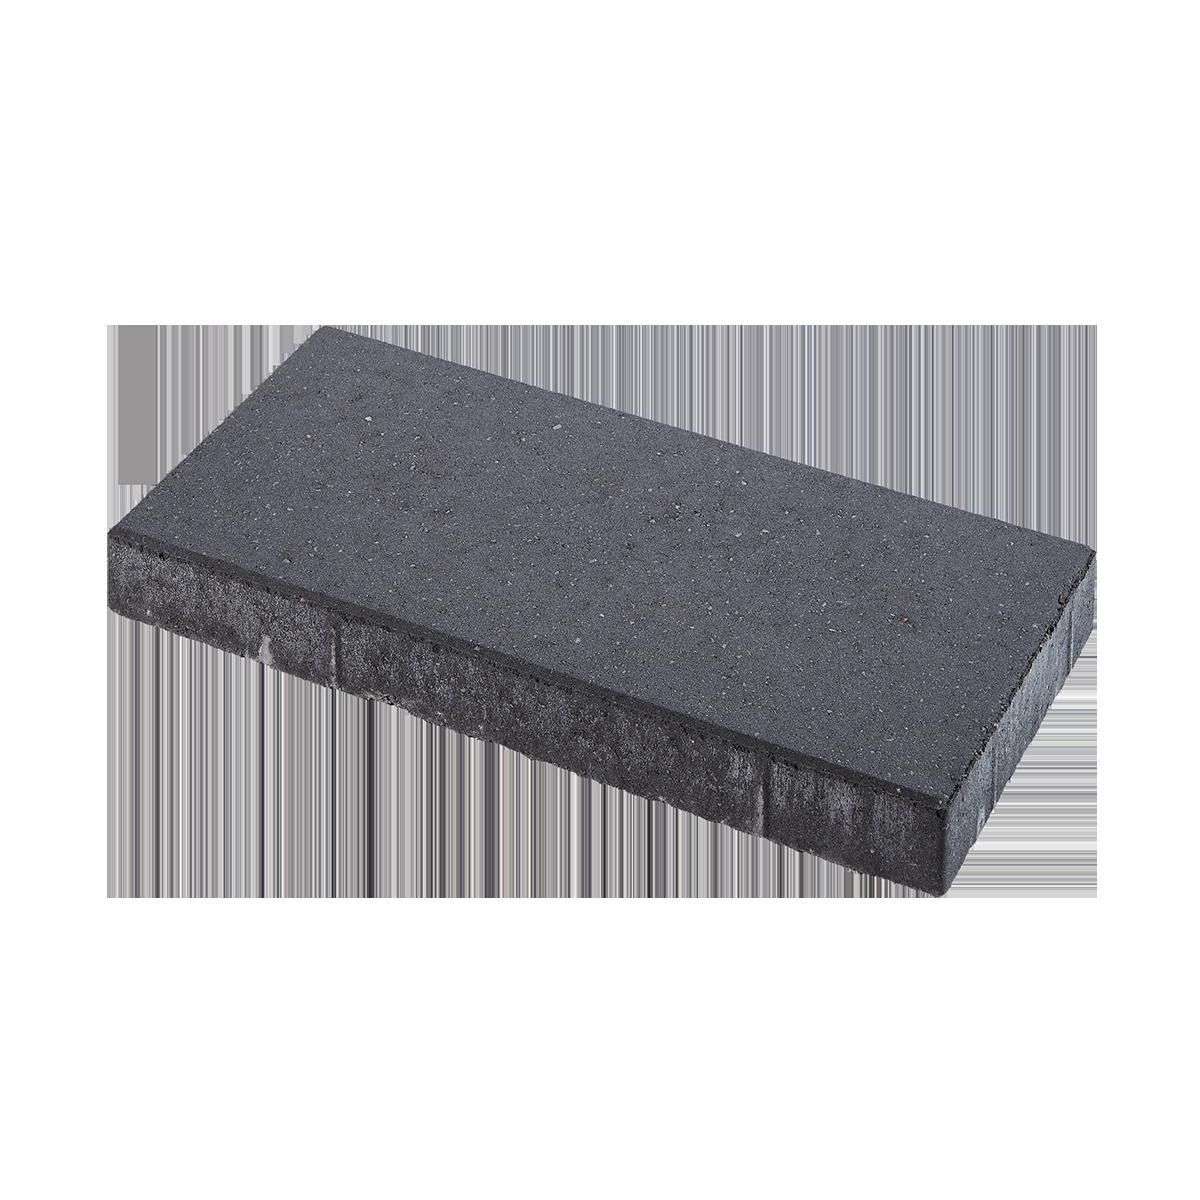 Fliser 30x60x6 cm Sort/Antracit